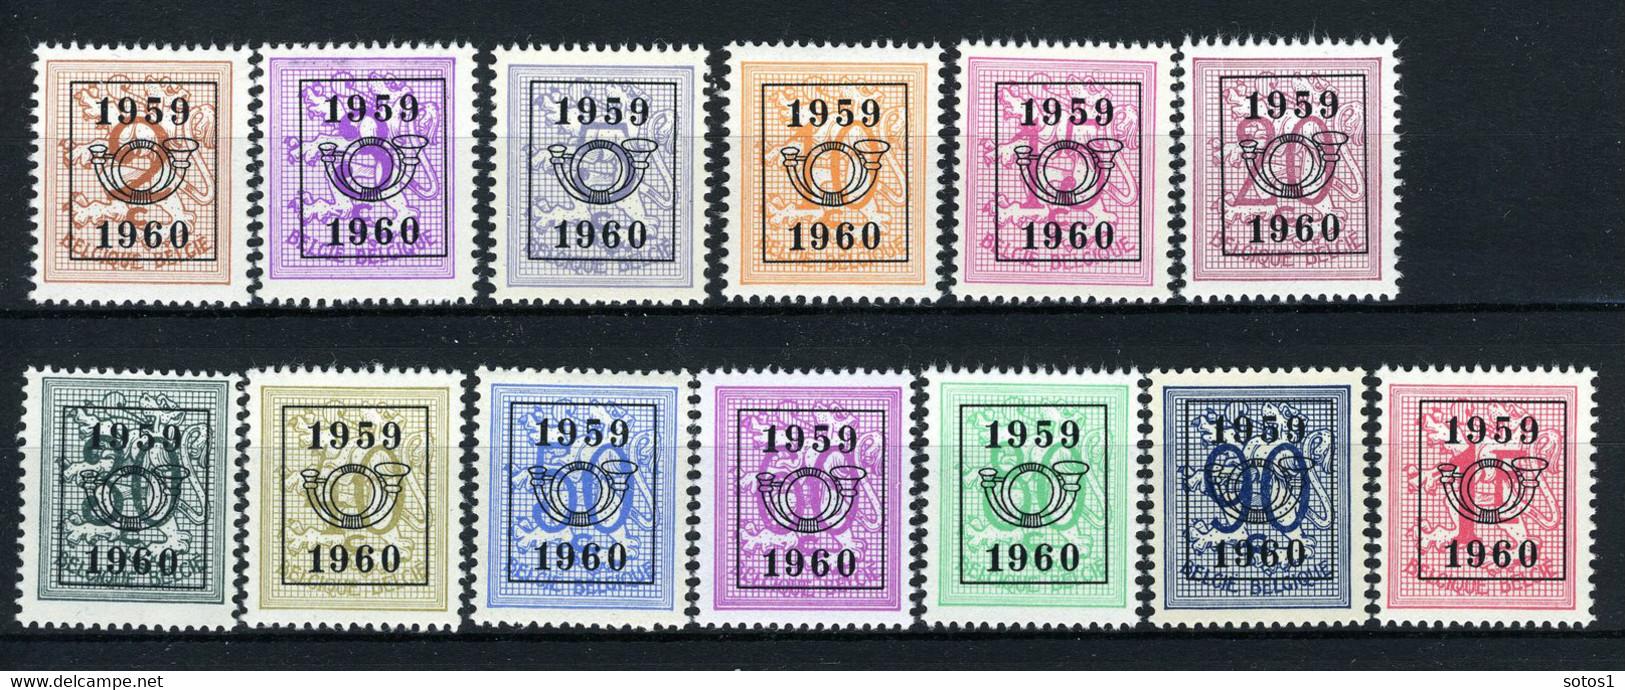 PRE686/698 MNH** 1959 - Cijfer Op Heraldieke Leeuw Type E - REEKS 52 - Sobreimpresos 1951-80 (Chifras Sobre El Leon)